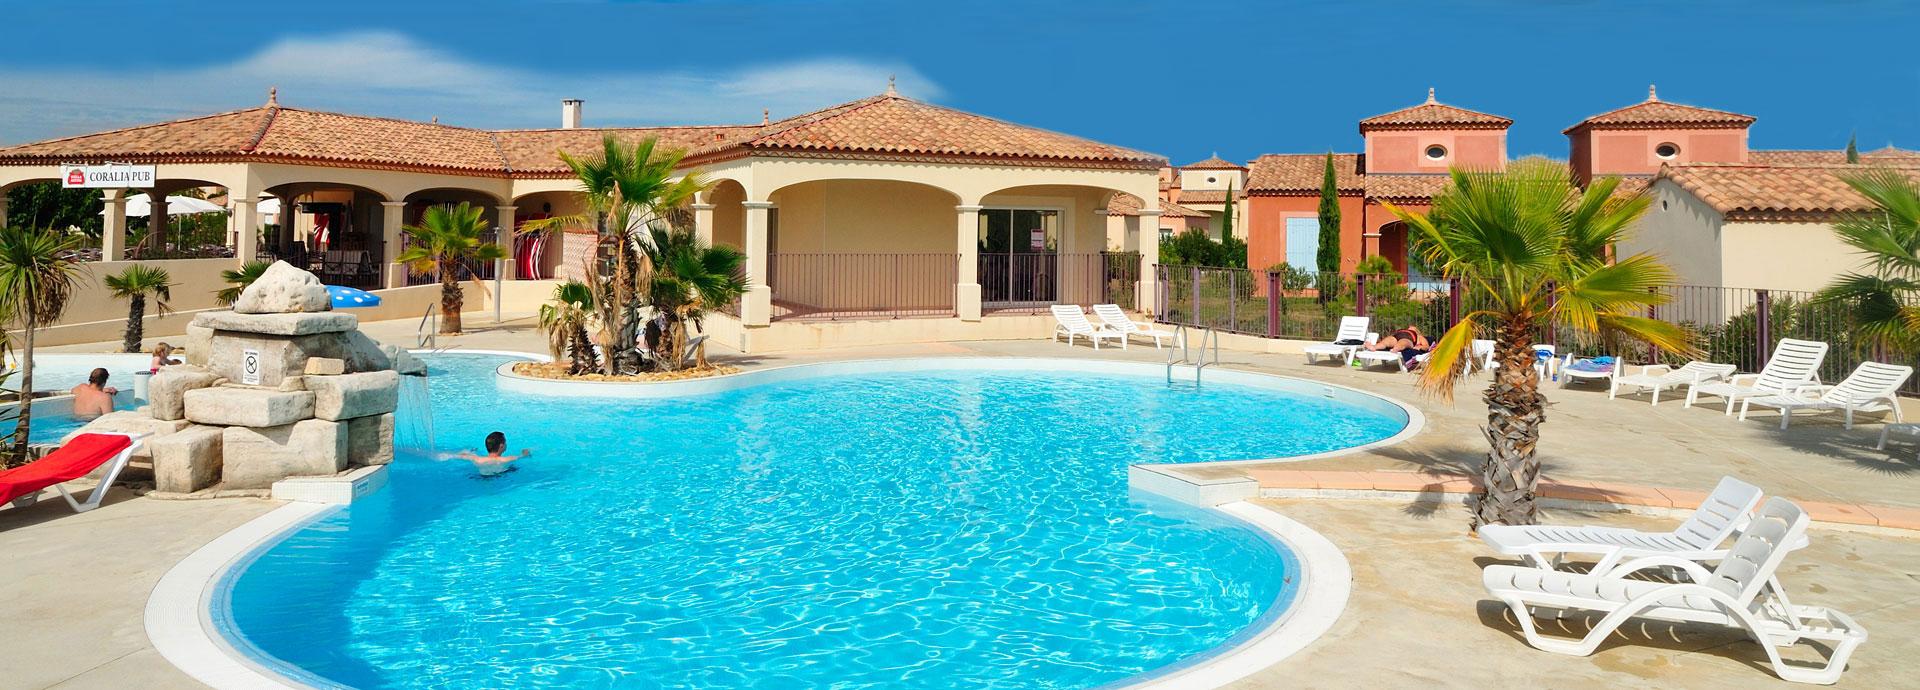 Location vacances en m diterran e coralia vacances - Residence vacances var avec piscine ...